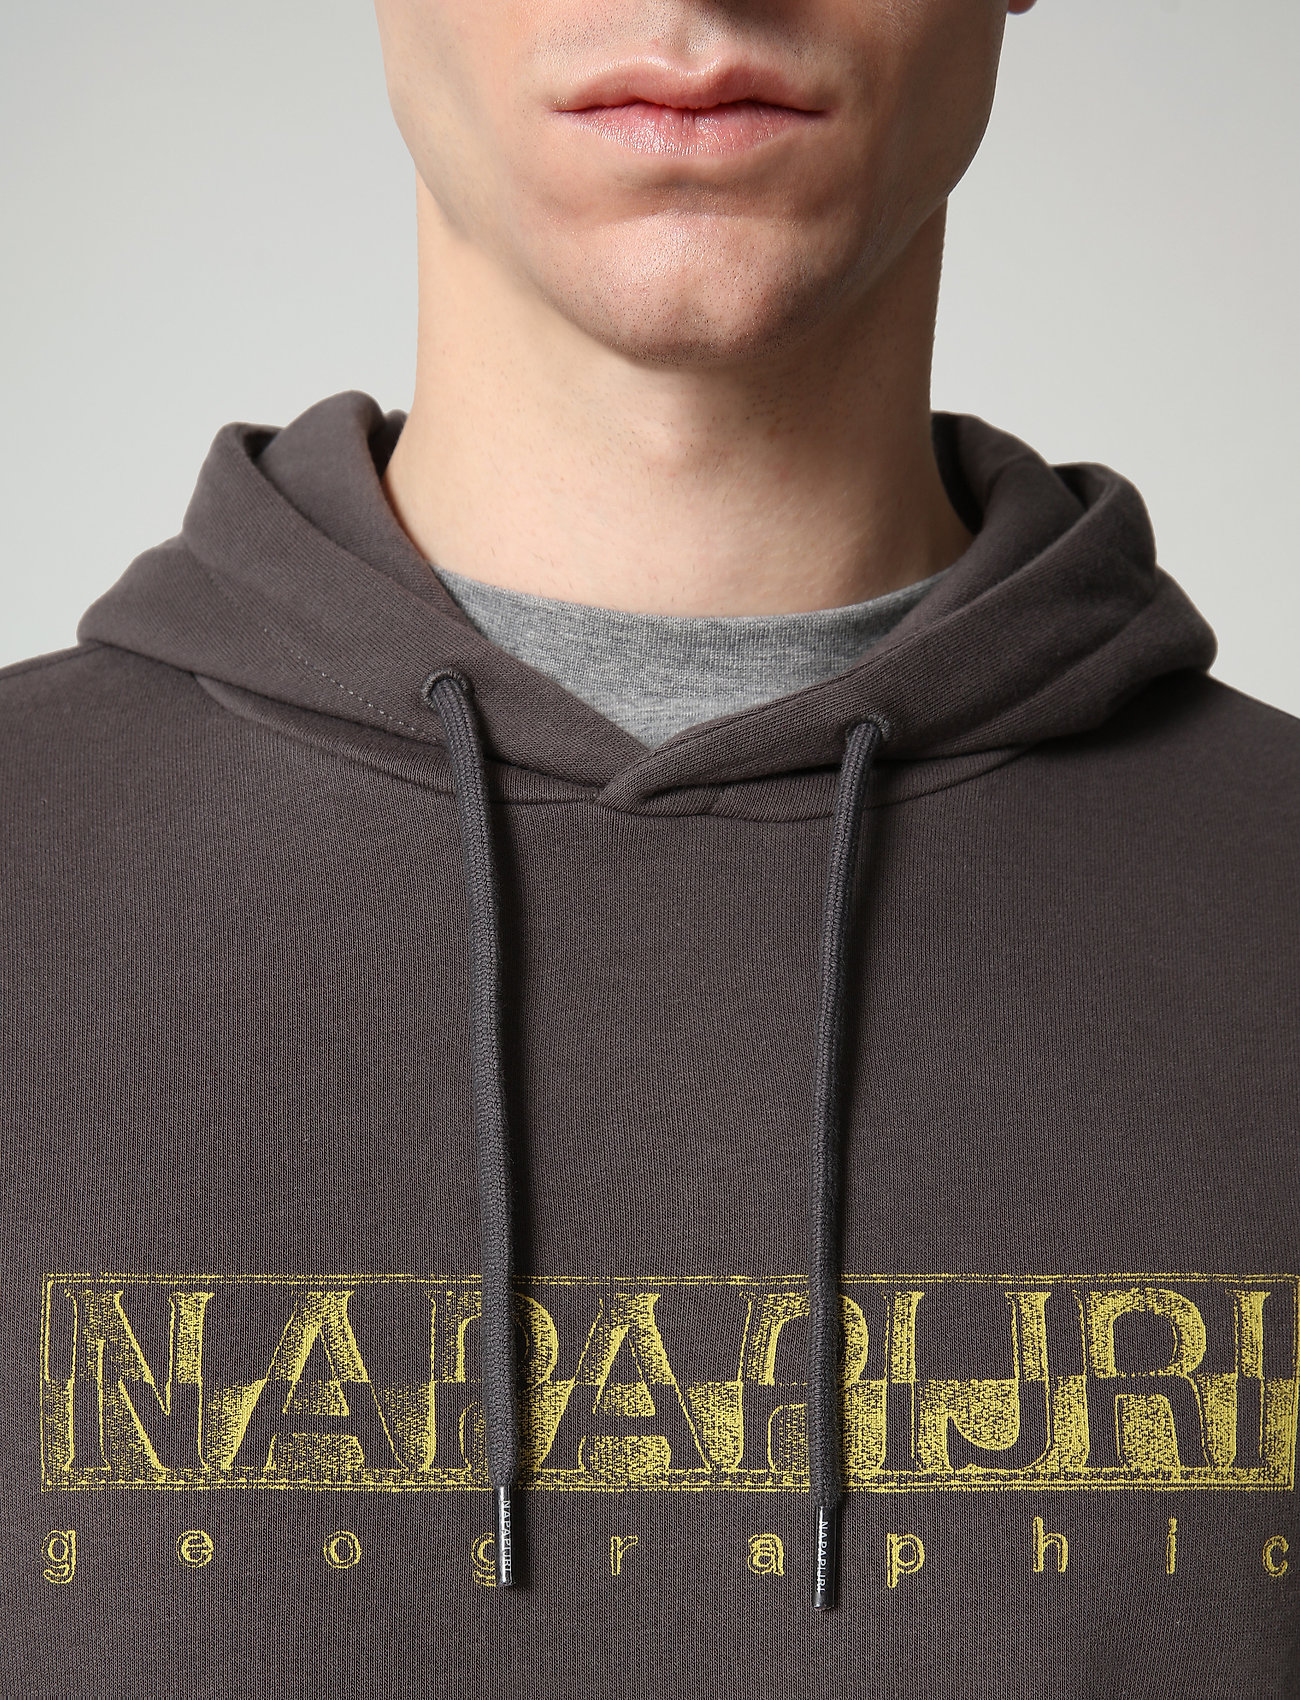 Napapijri - BALLAR H - hoodies - dark grey solid - 5